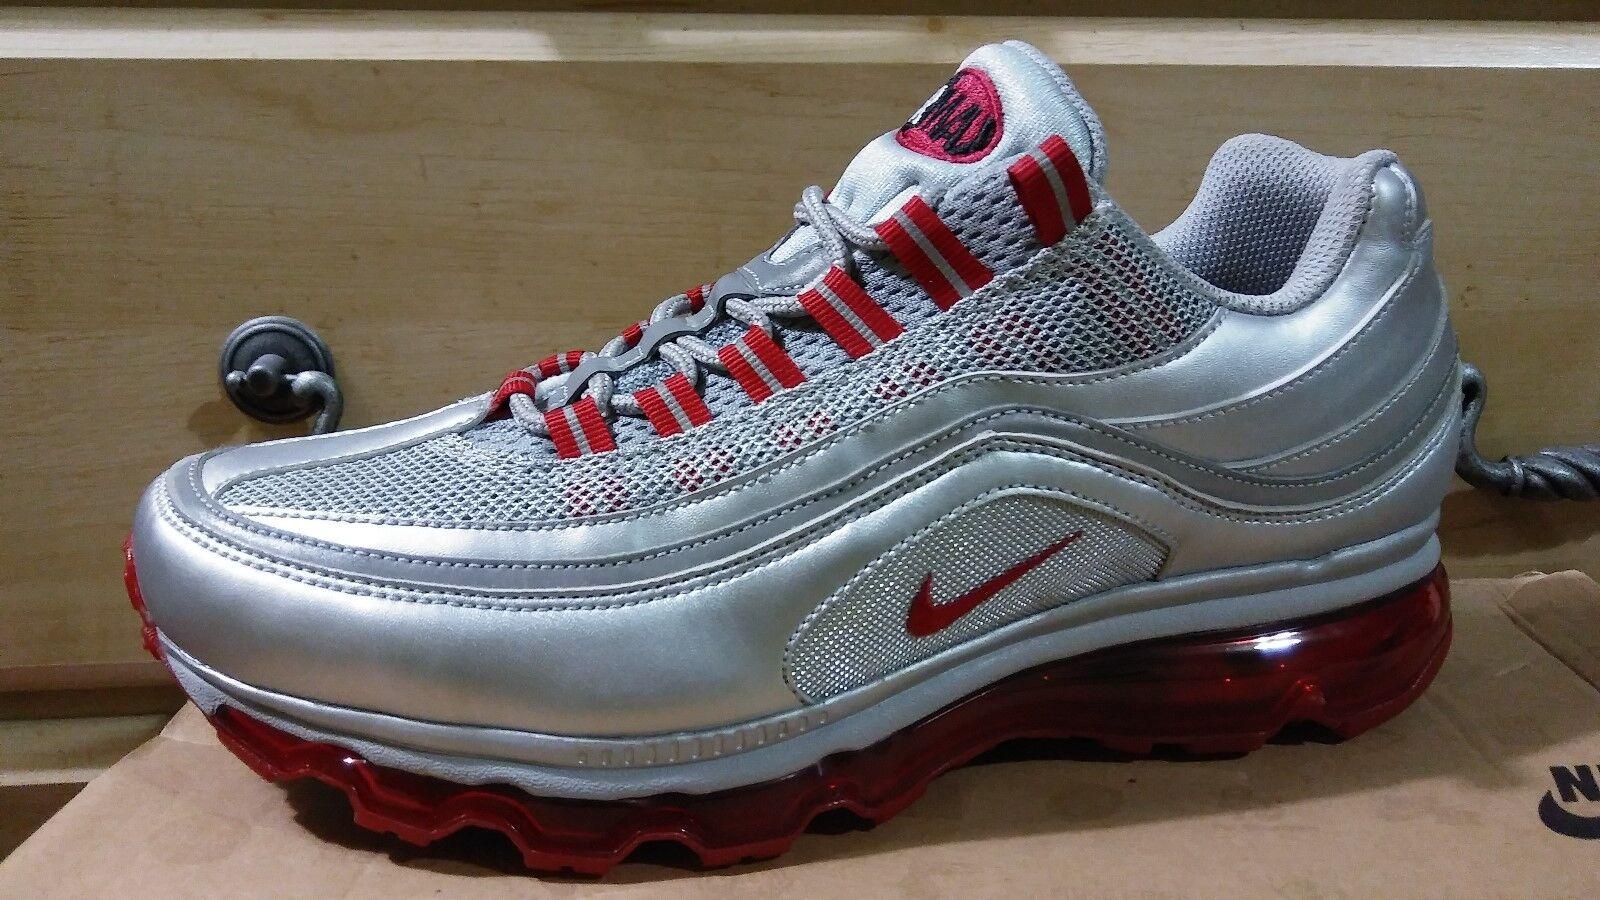 bb51059c0e New Mens Nike Air Max 24-7 Sz 8.5 Metallic Silver Varsity Red Grey Mesh